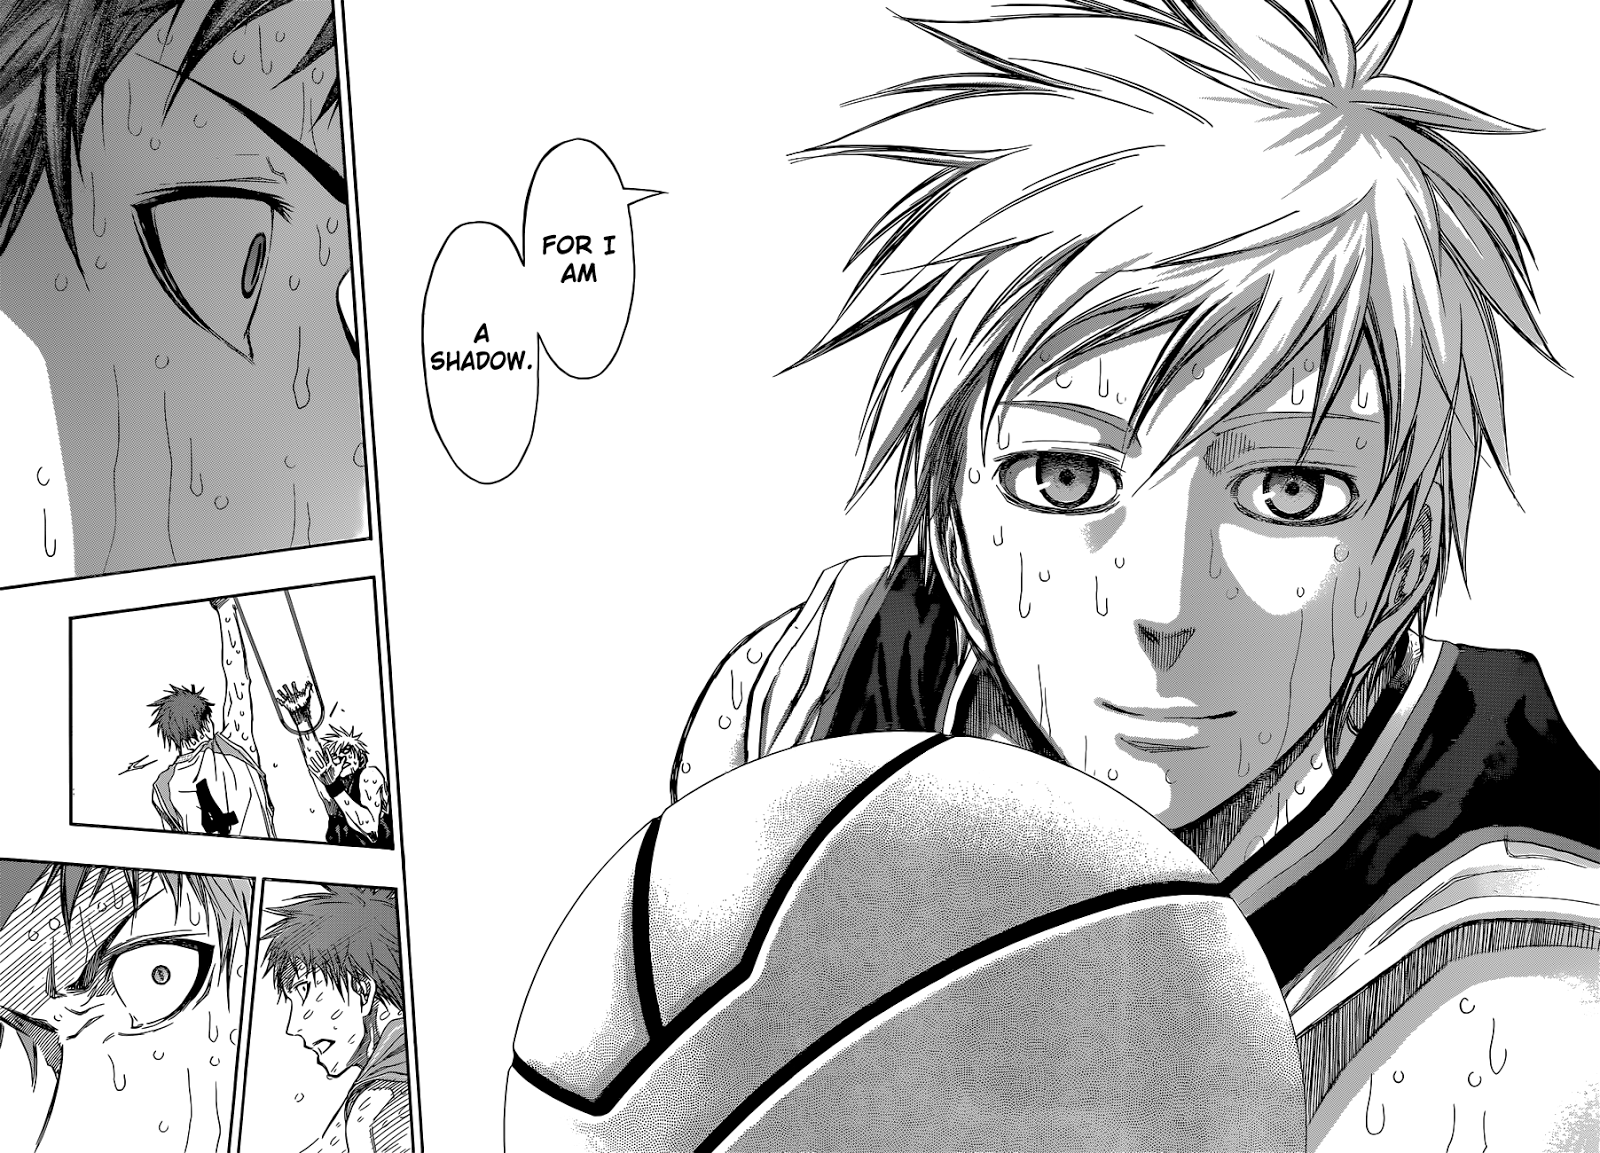 Kuroko no Basket Manga Chapter 274 - Image 11-12